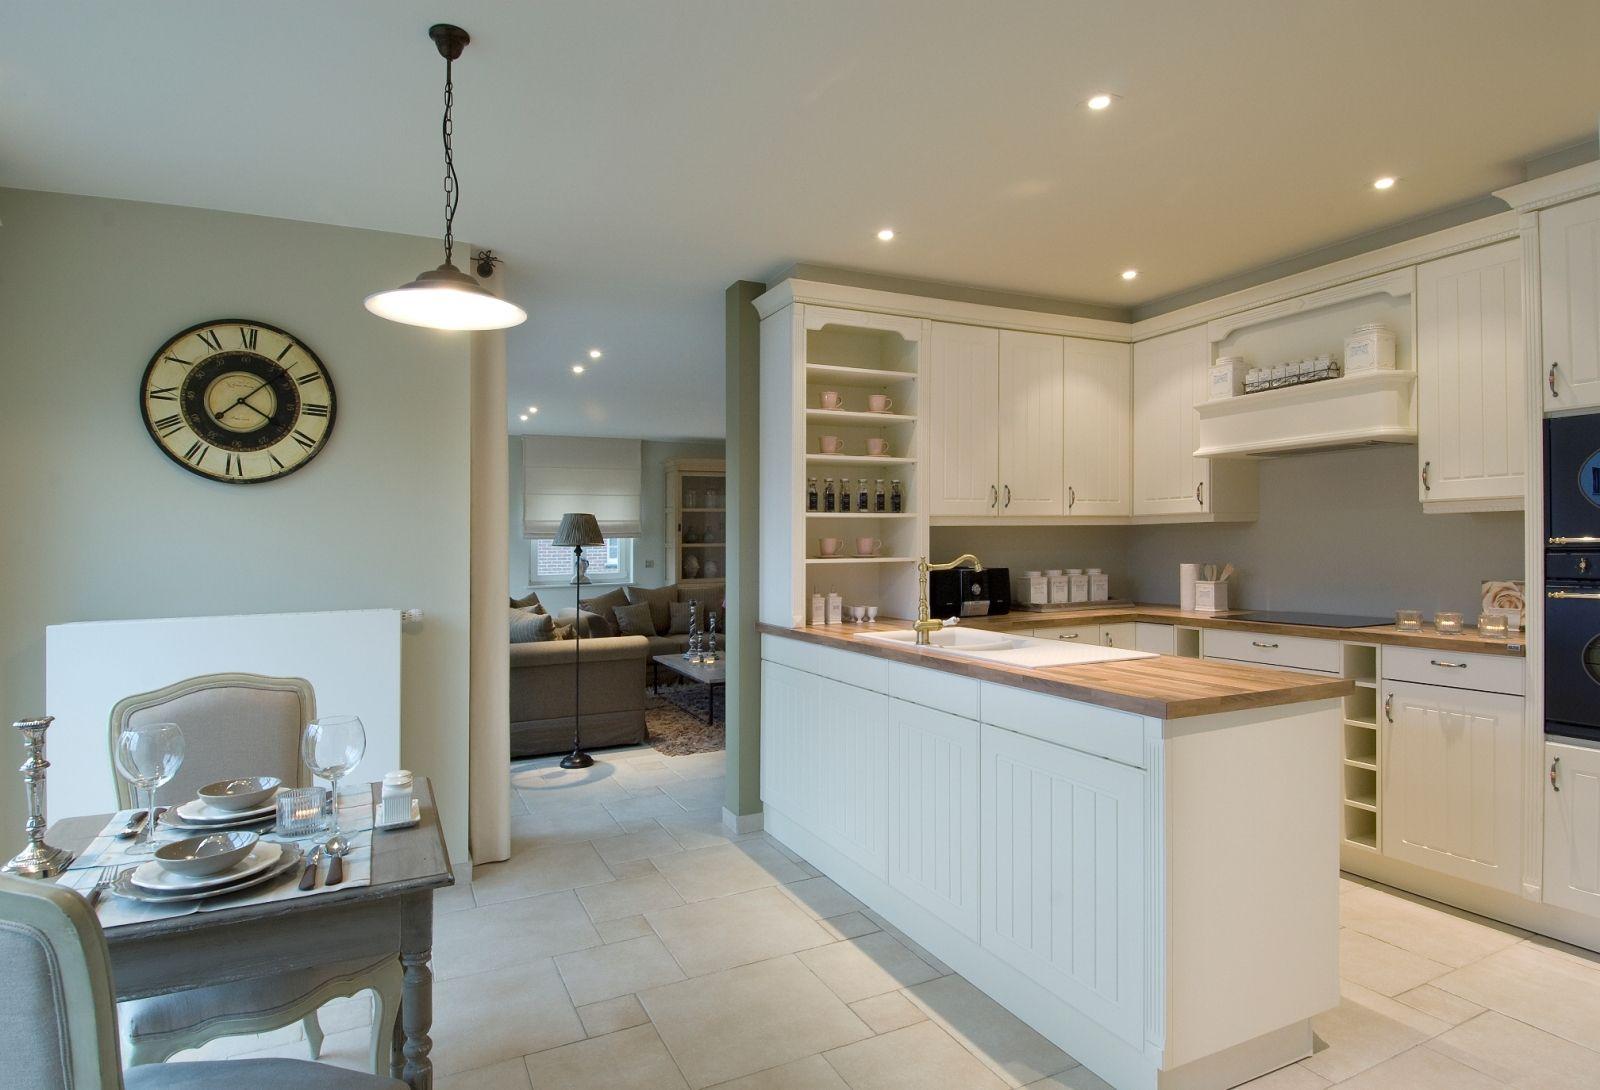 Keuken Verbouwen Planning : Share